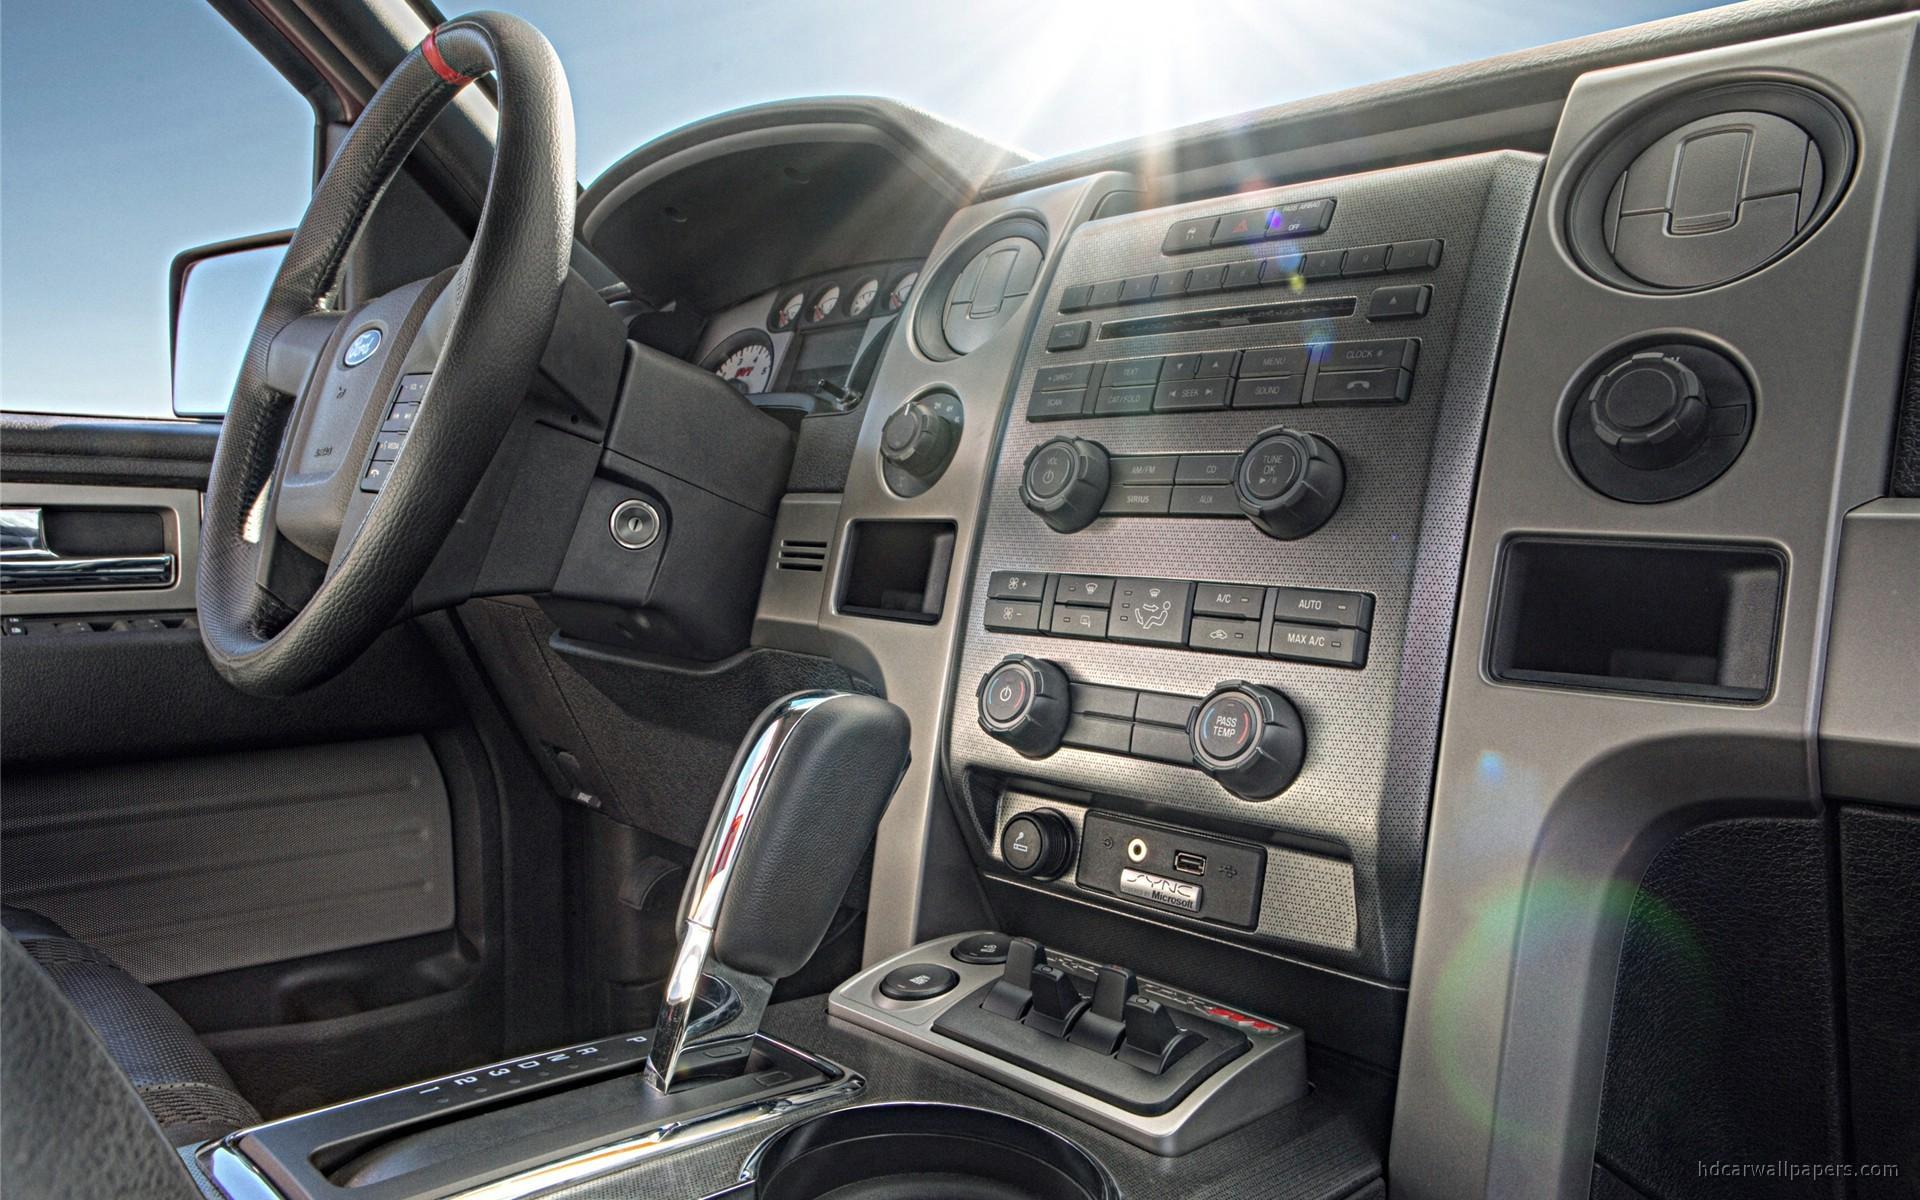 2010 Ford F150 Svt Raptor Interior Wallpaper Hd Car